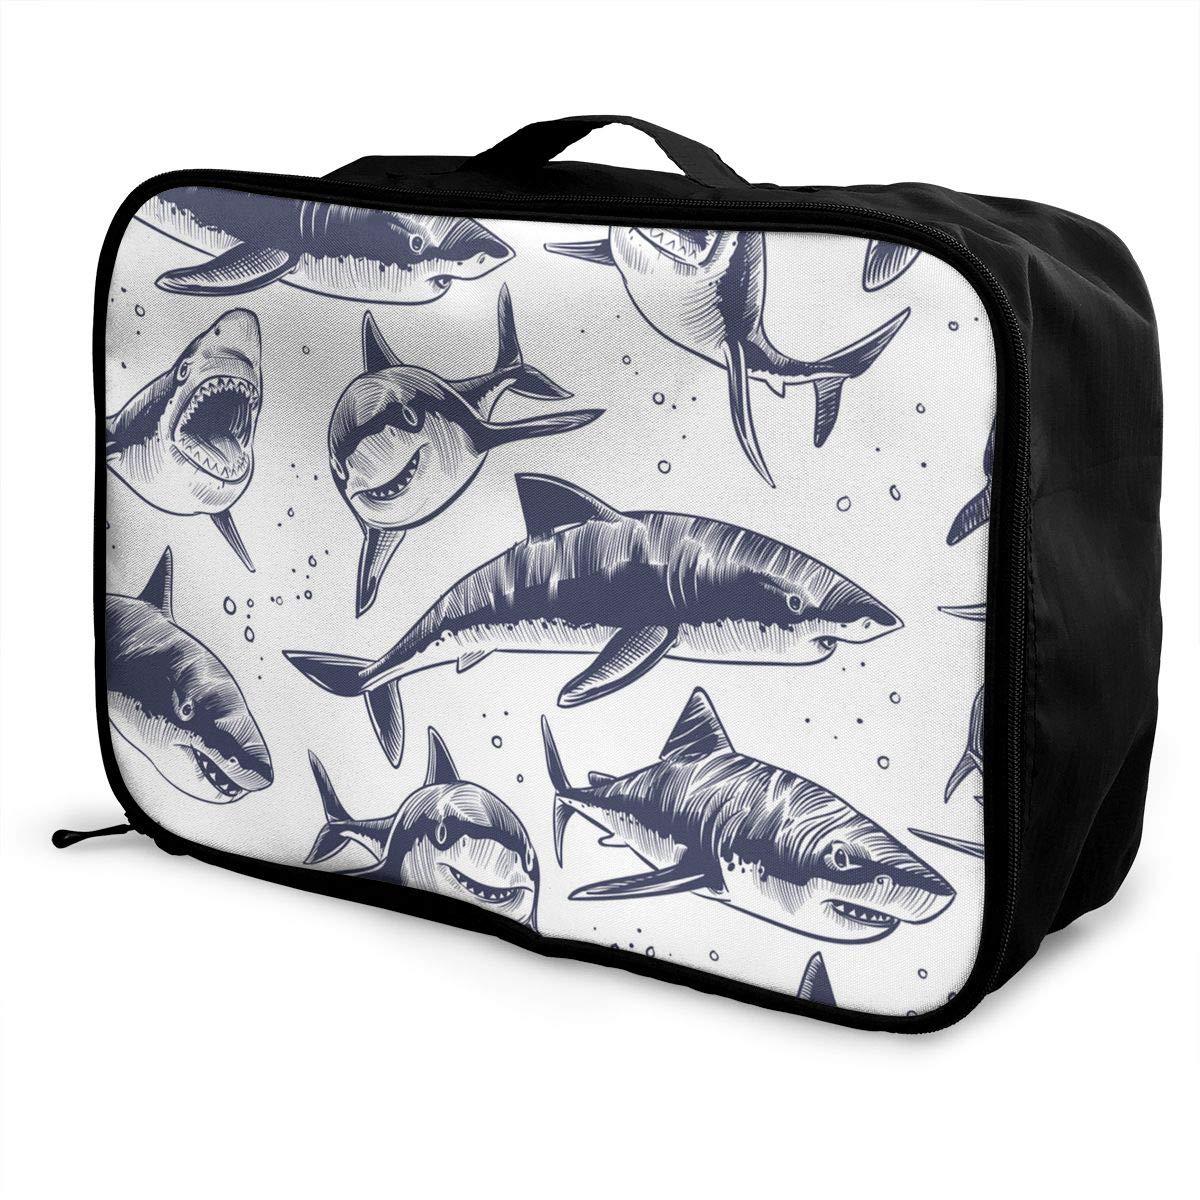 ADGAI Sharks Seamless Pattern Hand Drawn Underwater Sea Canvas Travel Weekender Bag,Fashion Custom Lightweight Large Capacity Portable Luggage Bag,Suitcase Trolley Bag